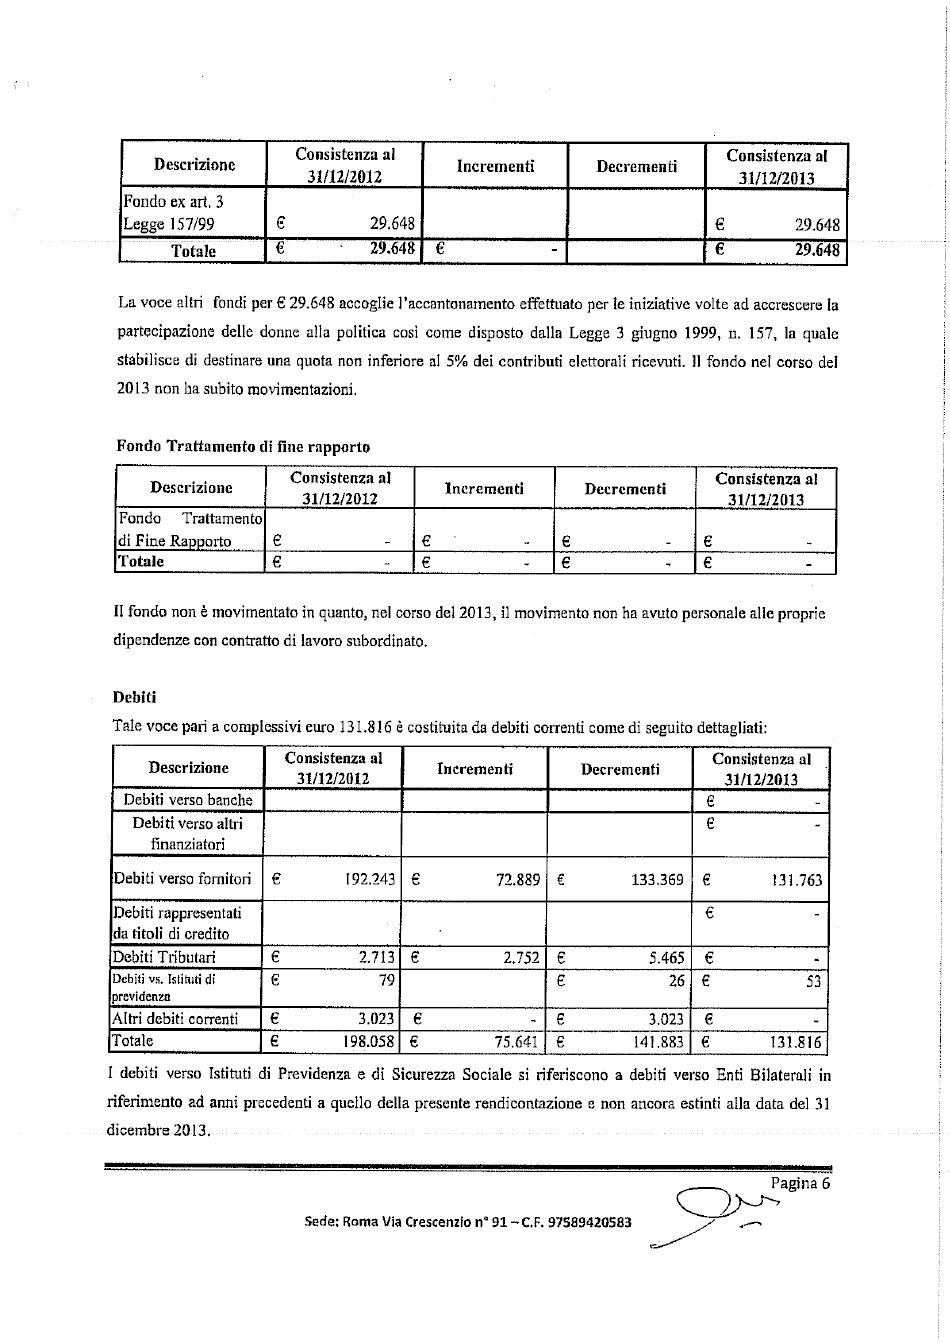 nota integrativa bilancio 2013-6